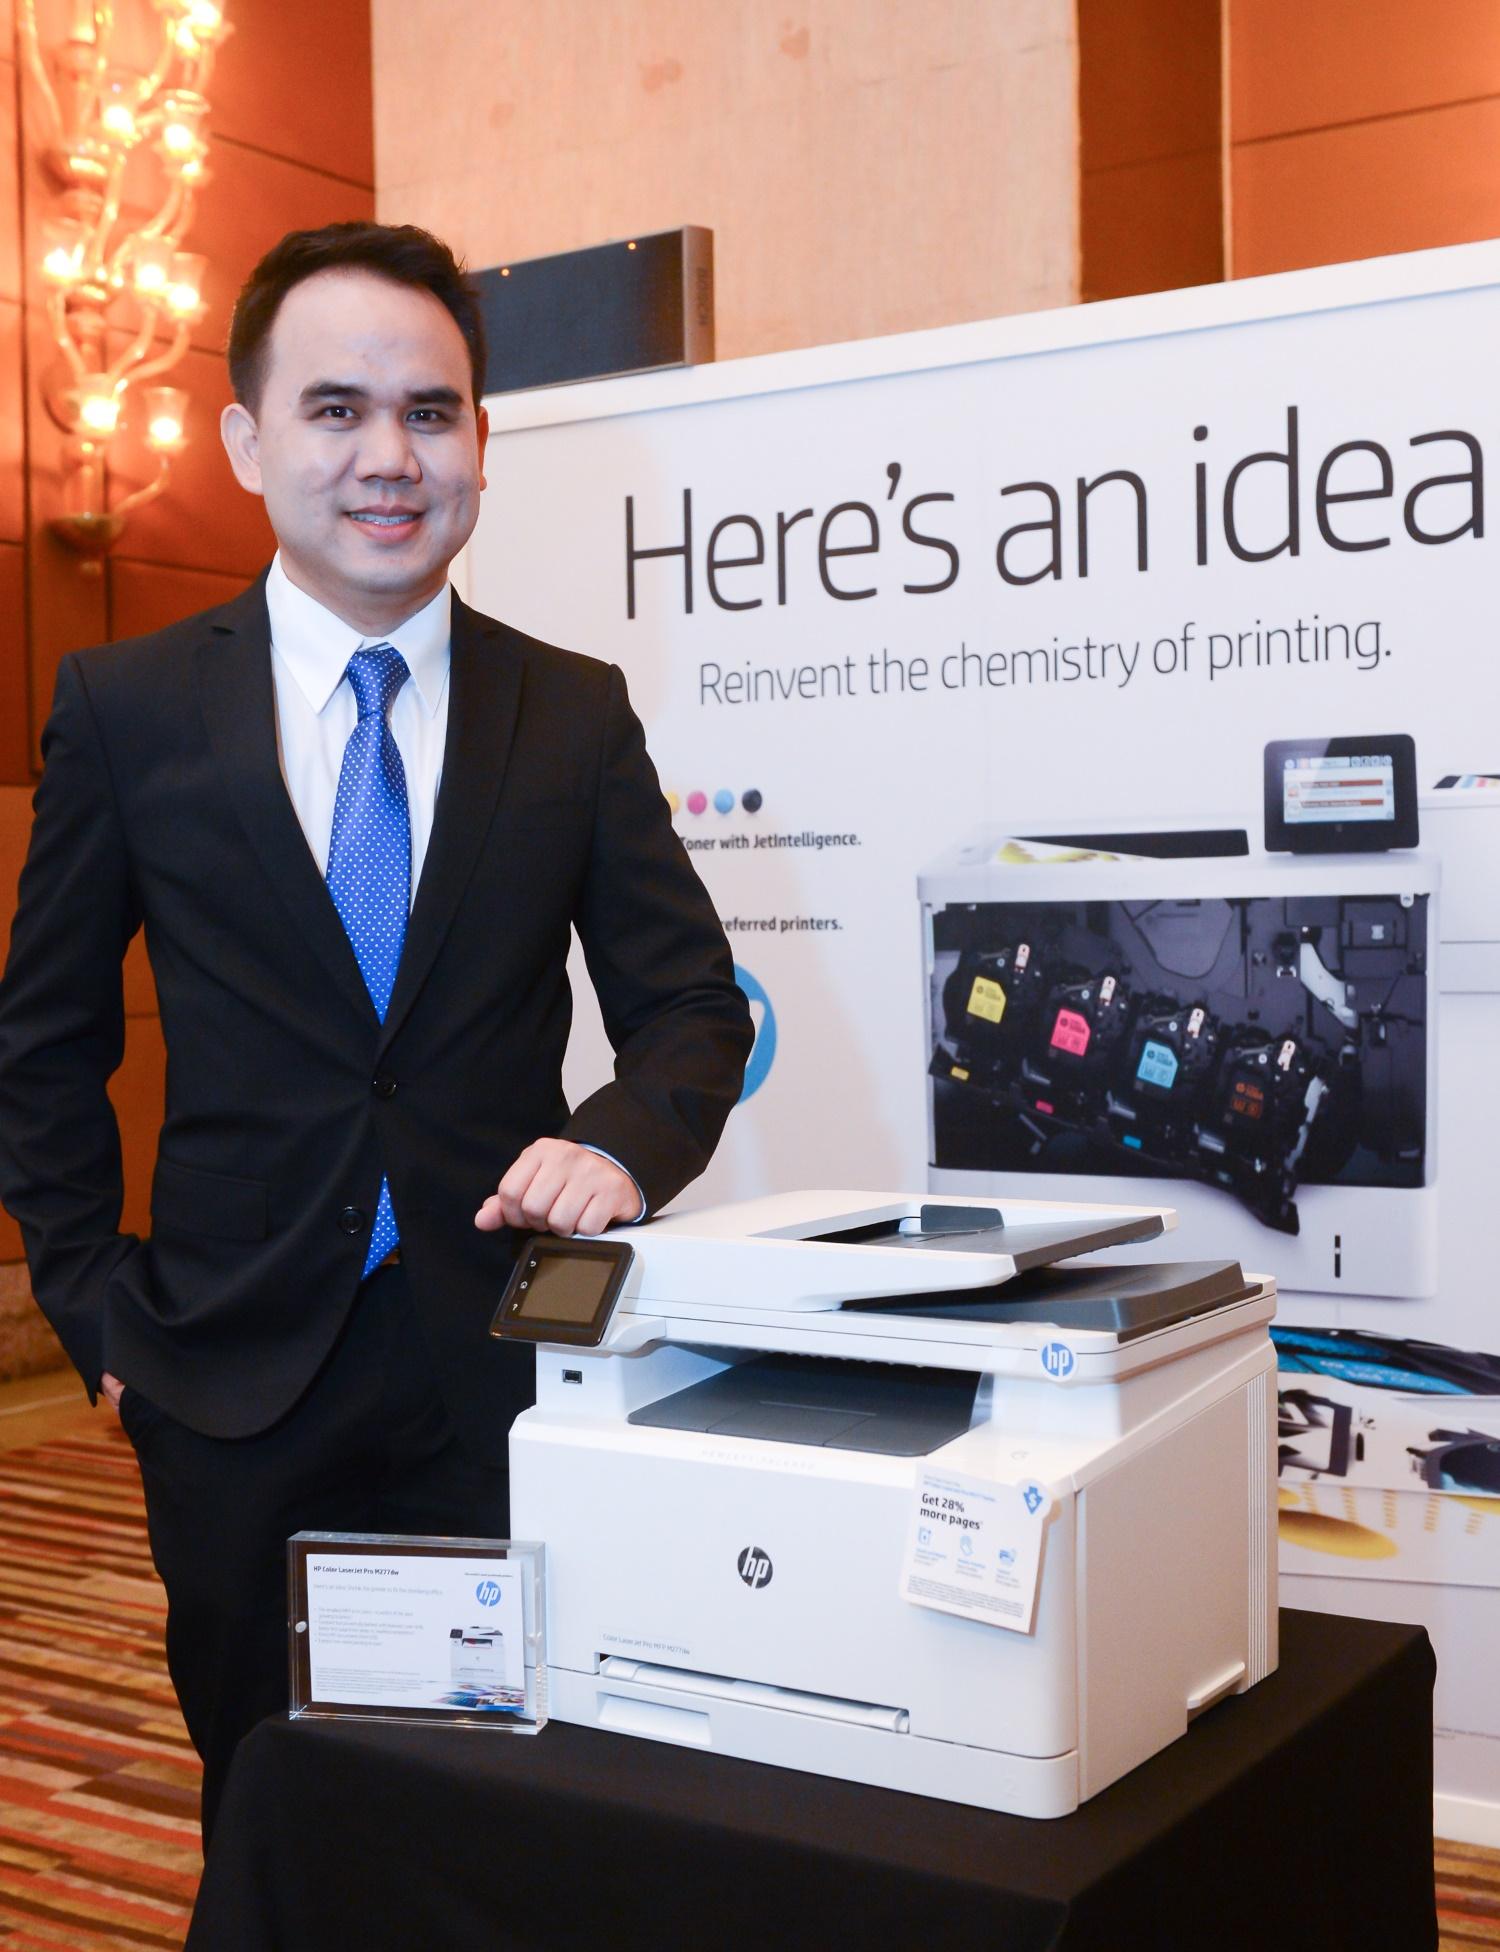 K Pavin with HP Color LaserJet Pro MFP M277_res